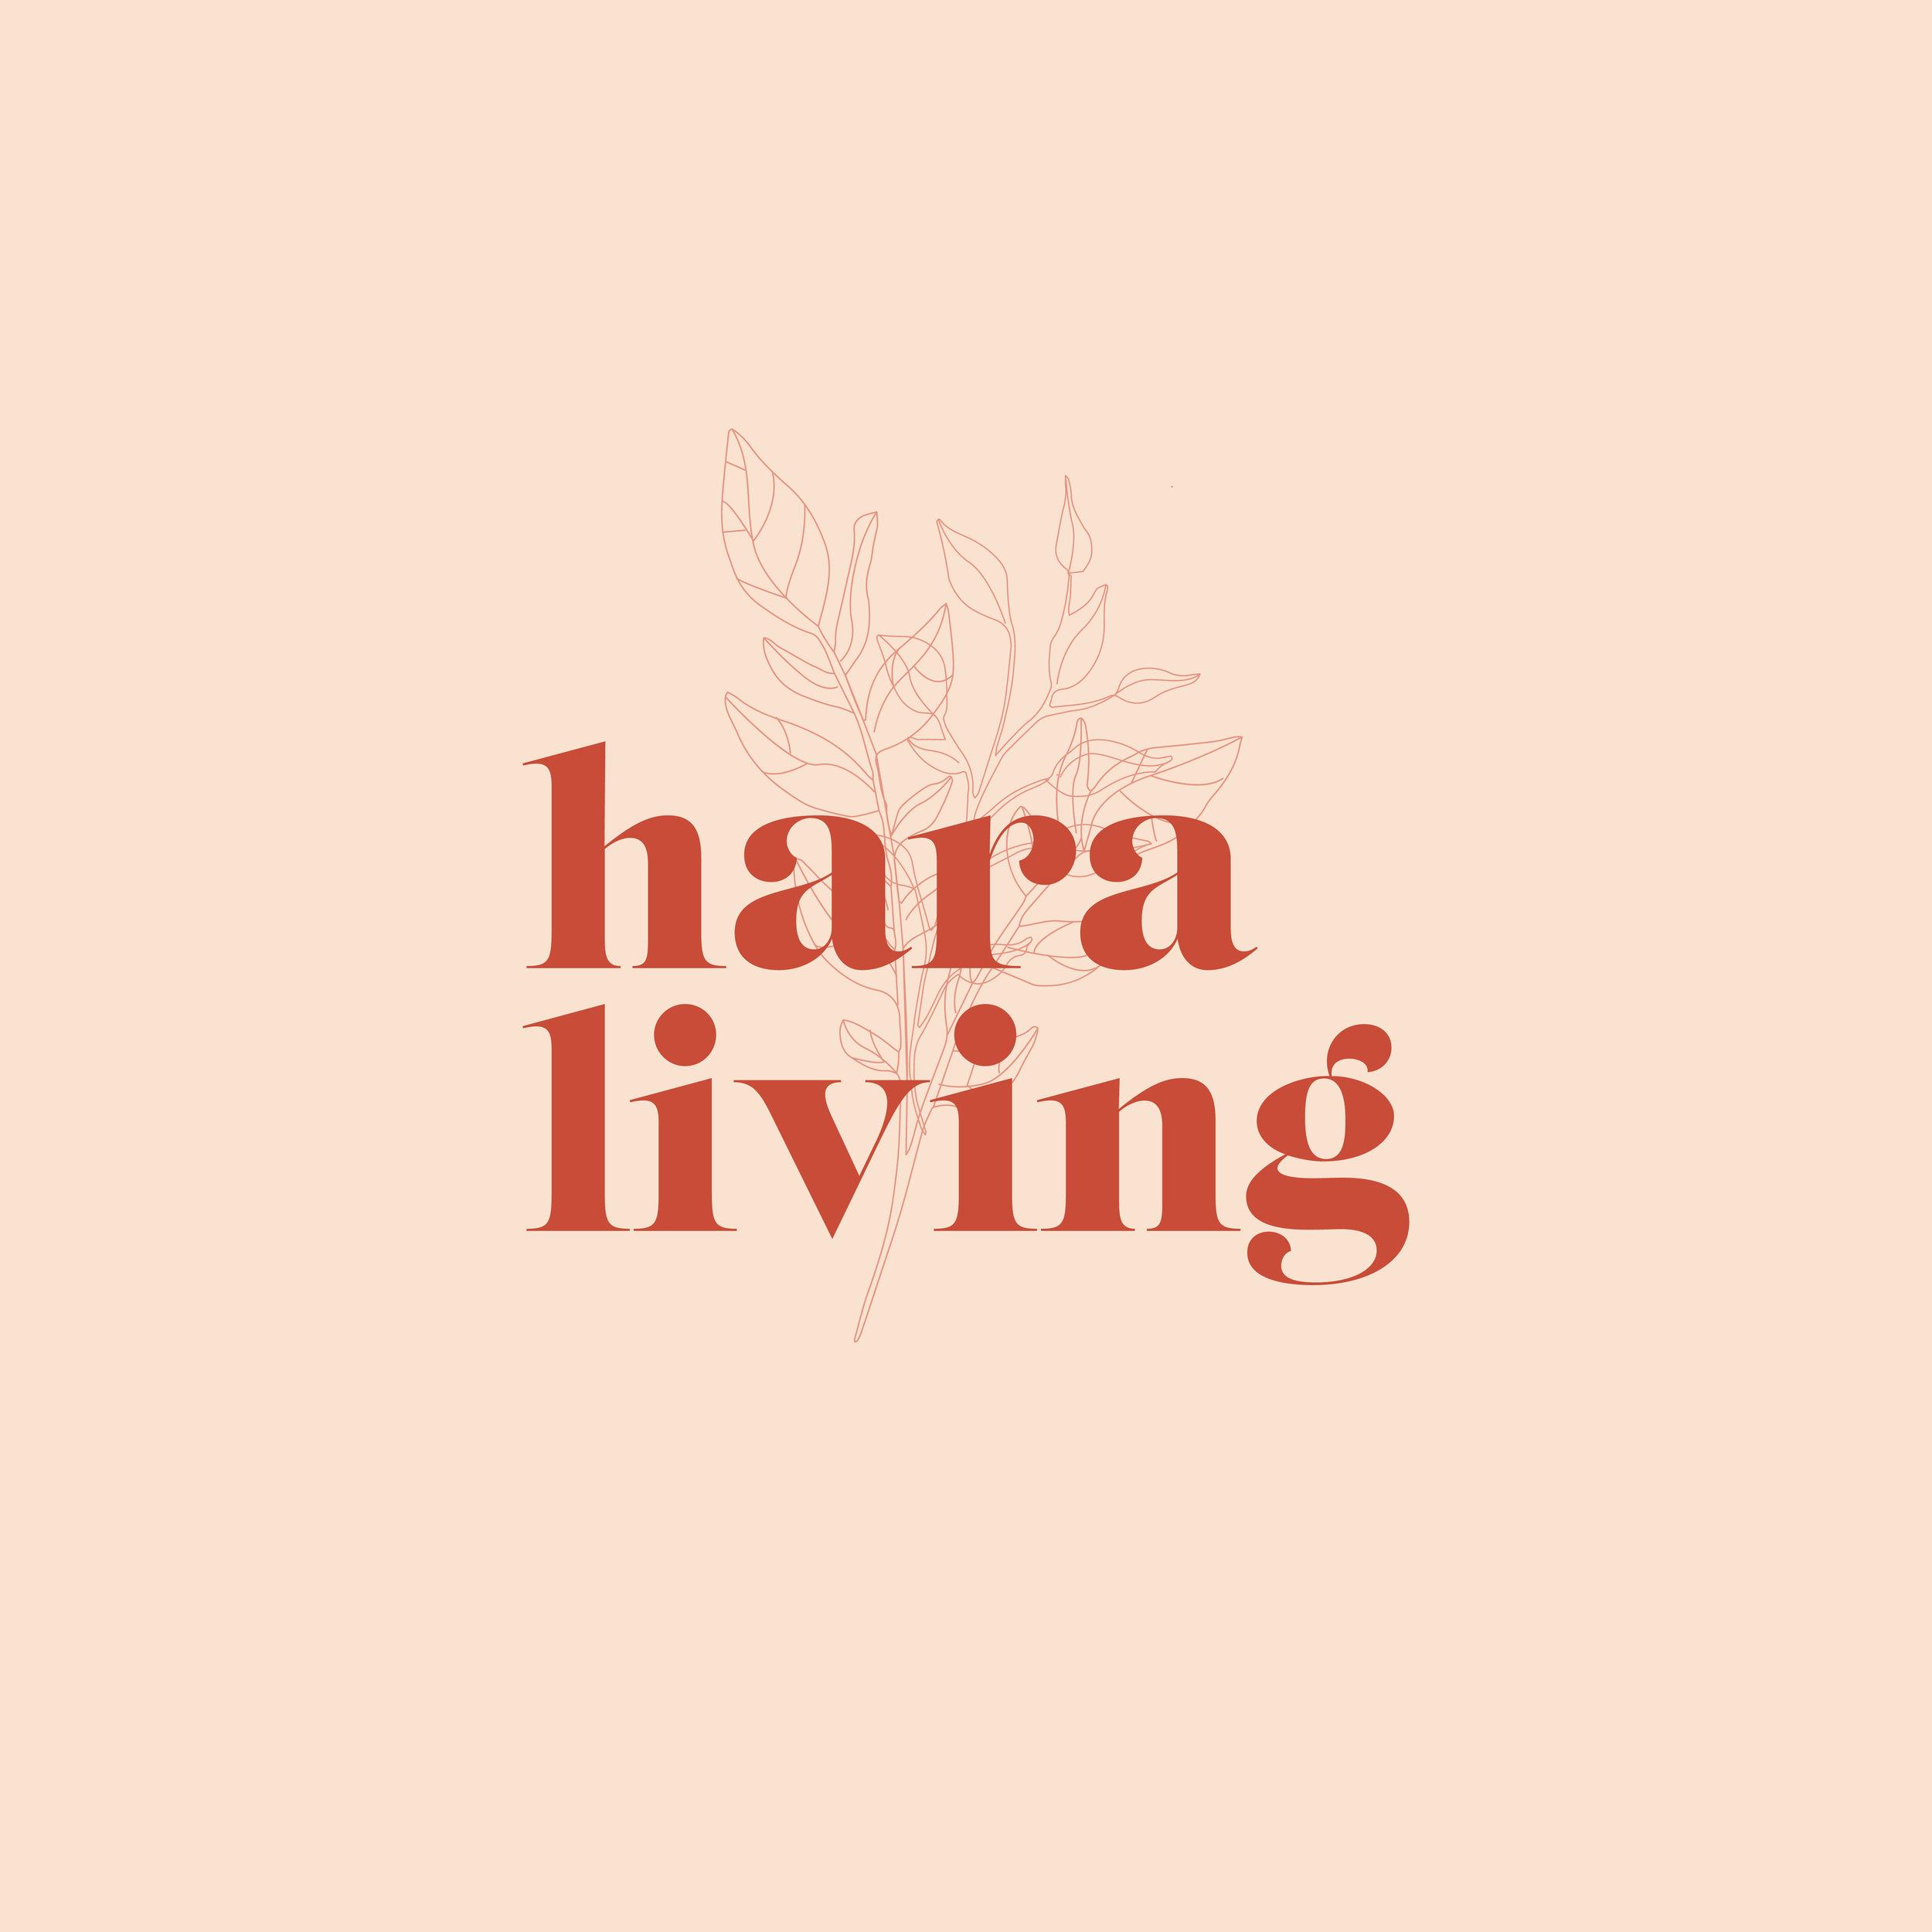 Hara Living